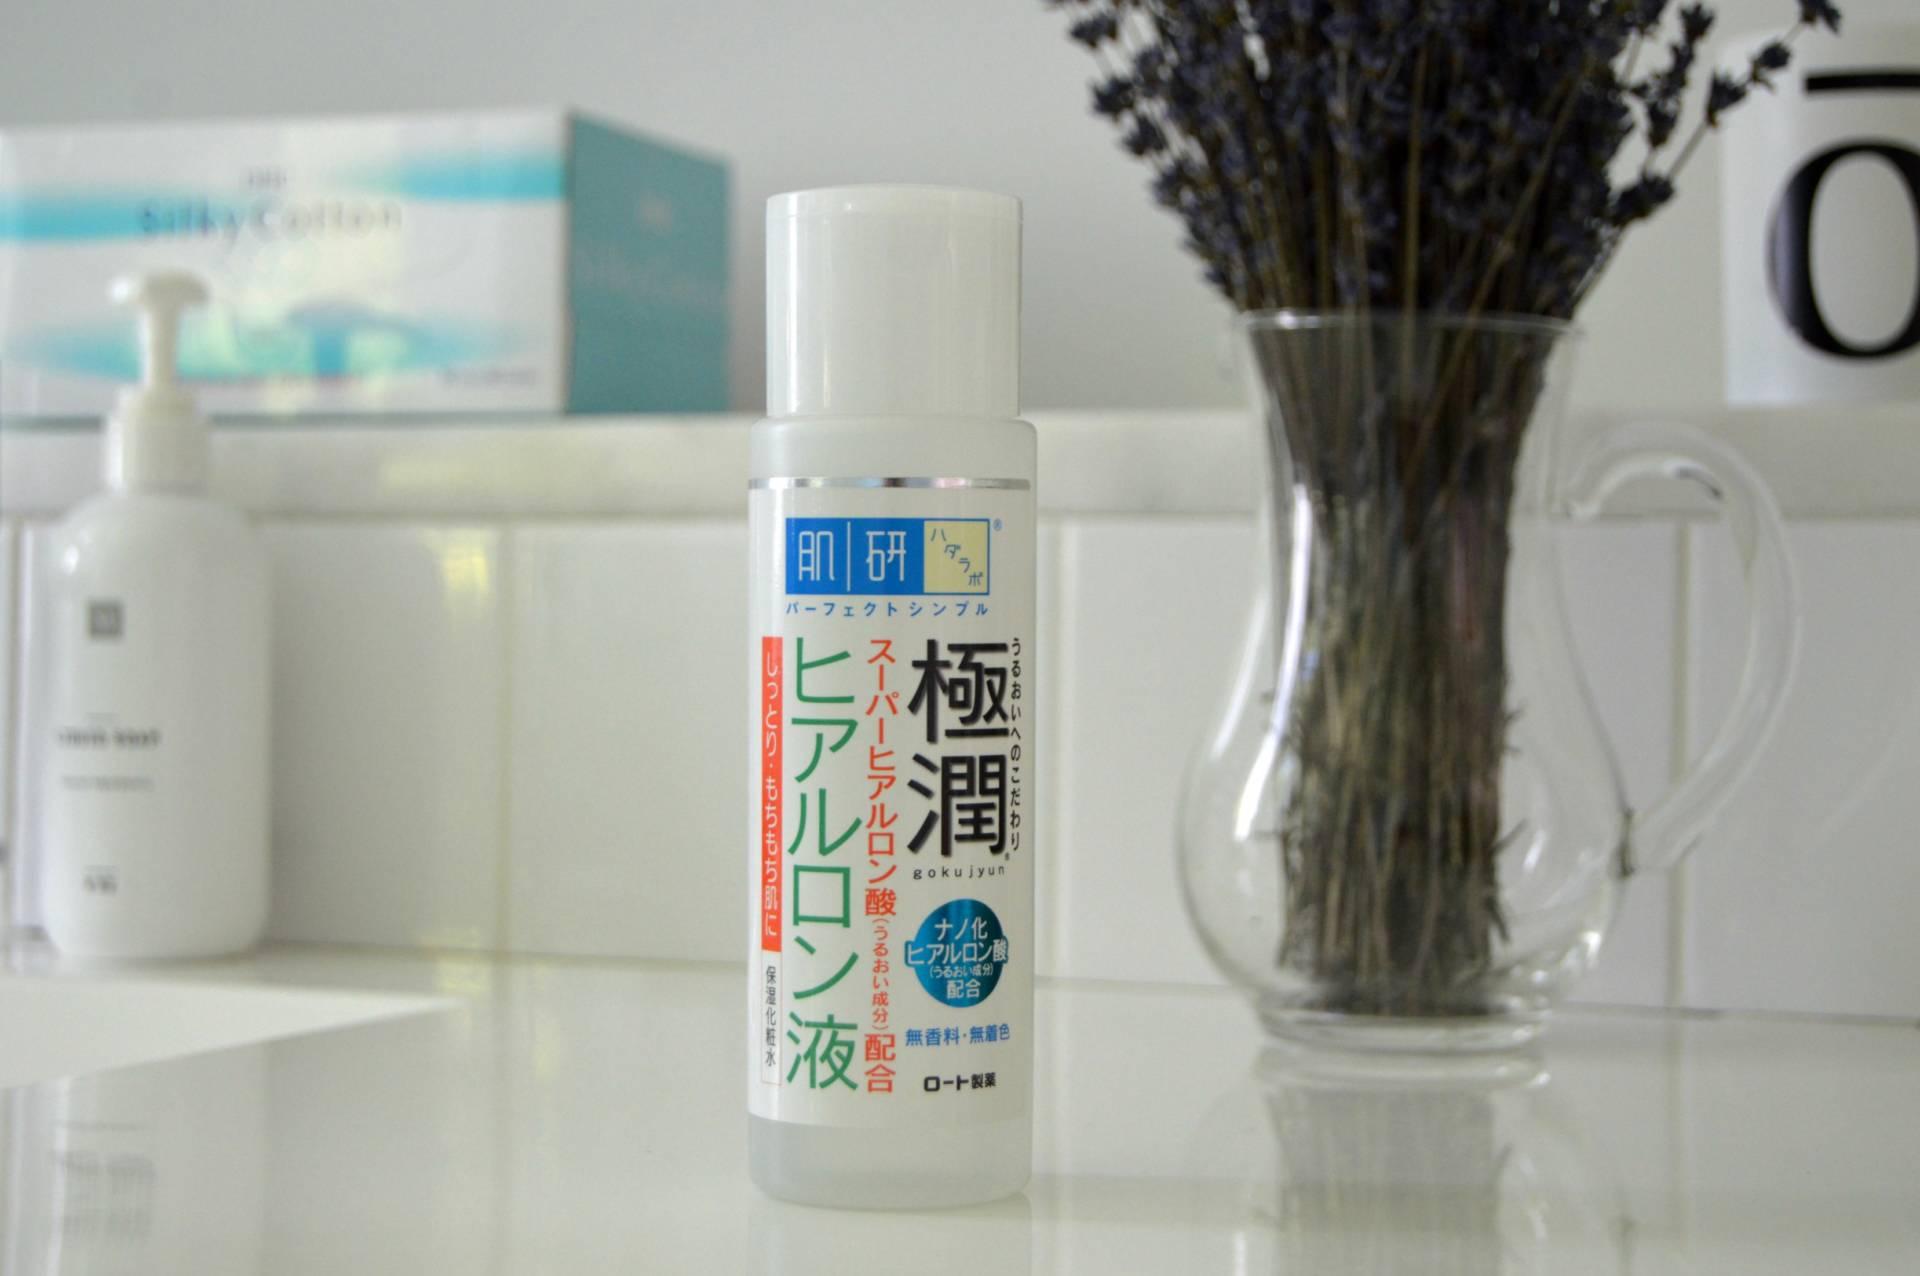 hada labo amazon hyaluronic lotion inhautepursuit review